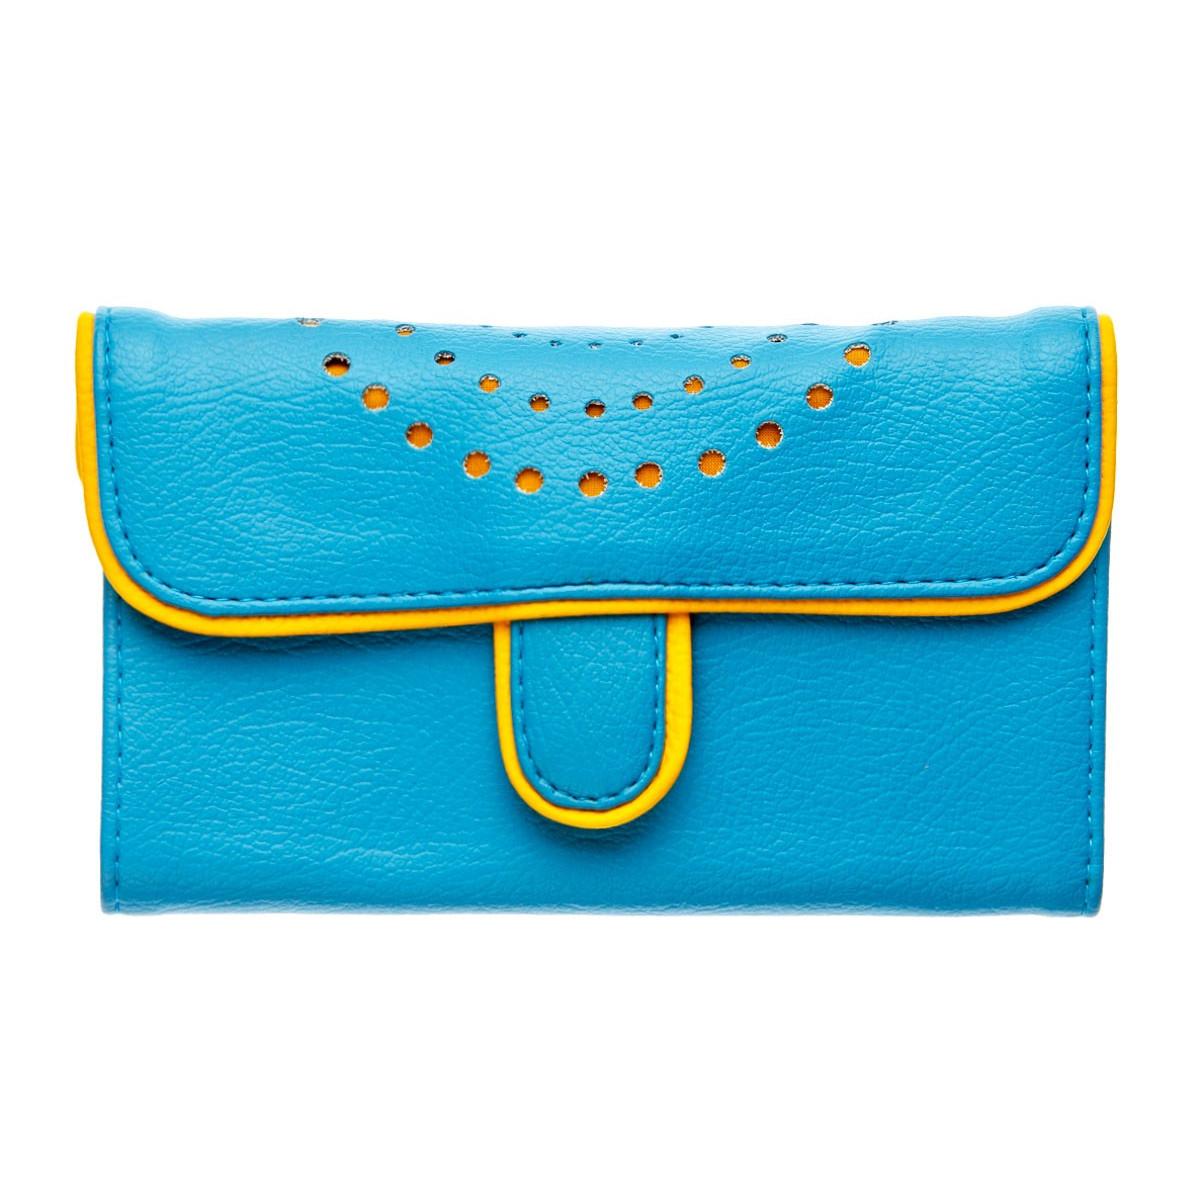 Portefeuille femme bleu et jaune